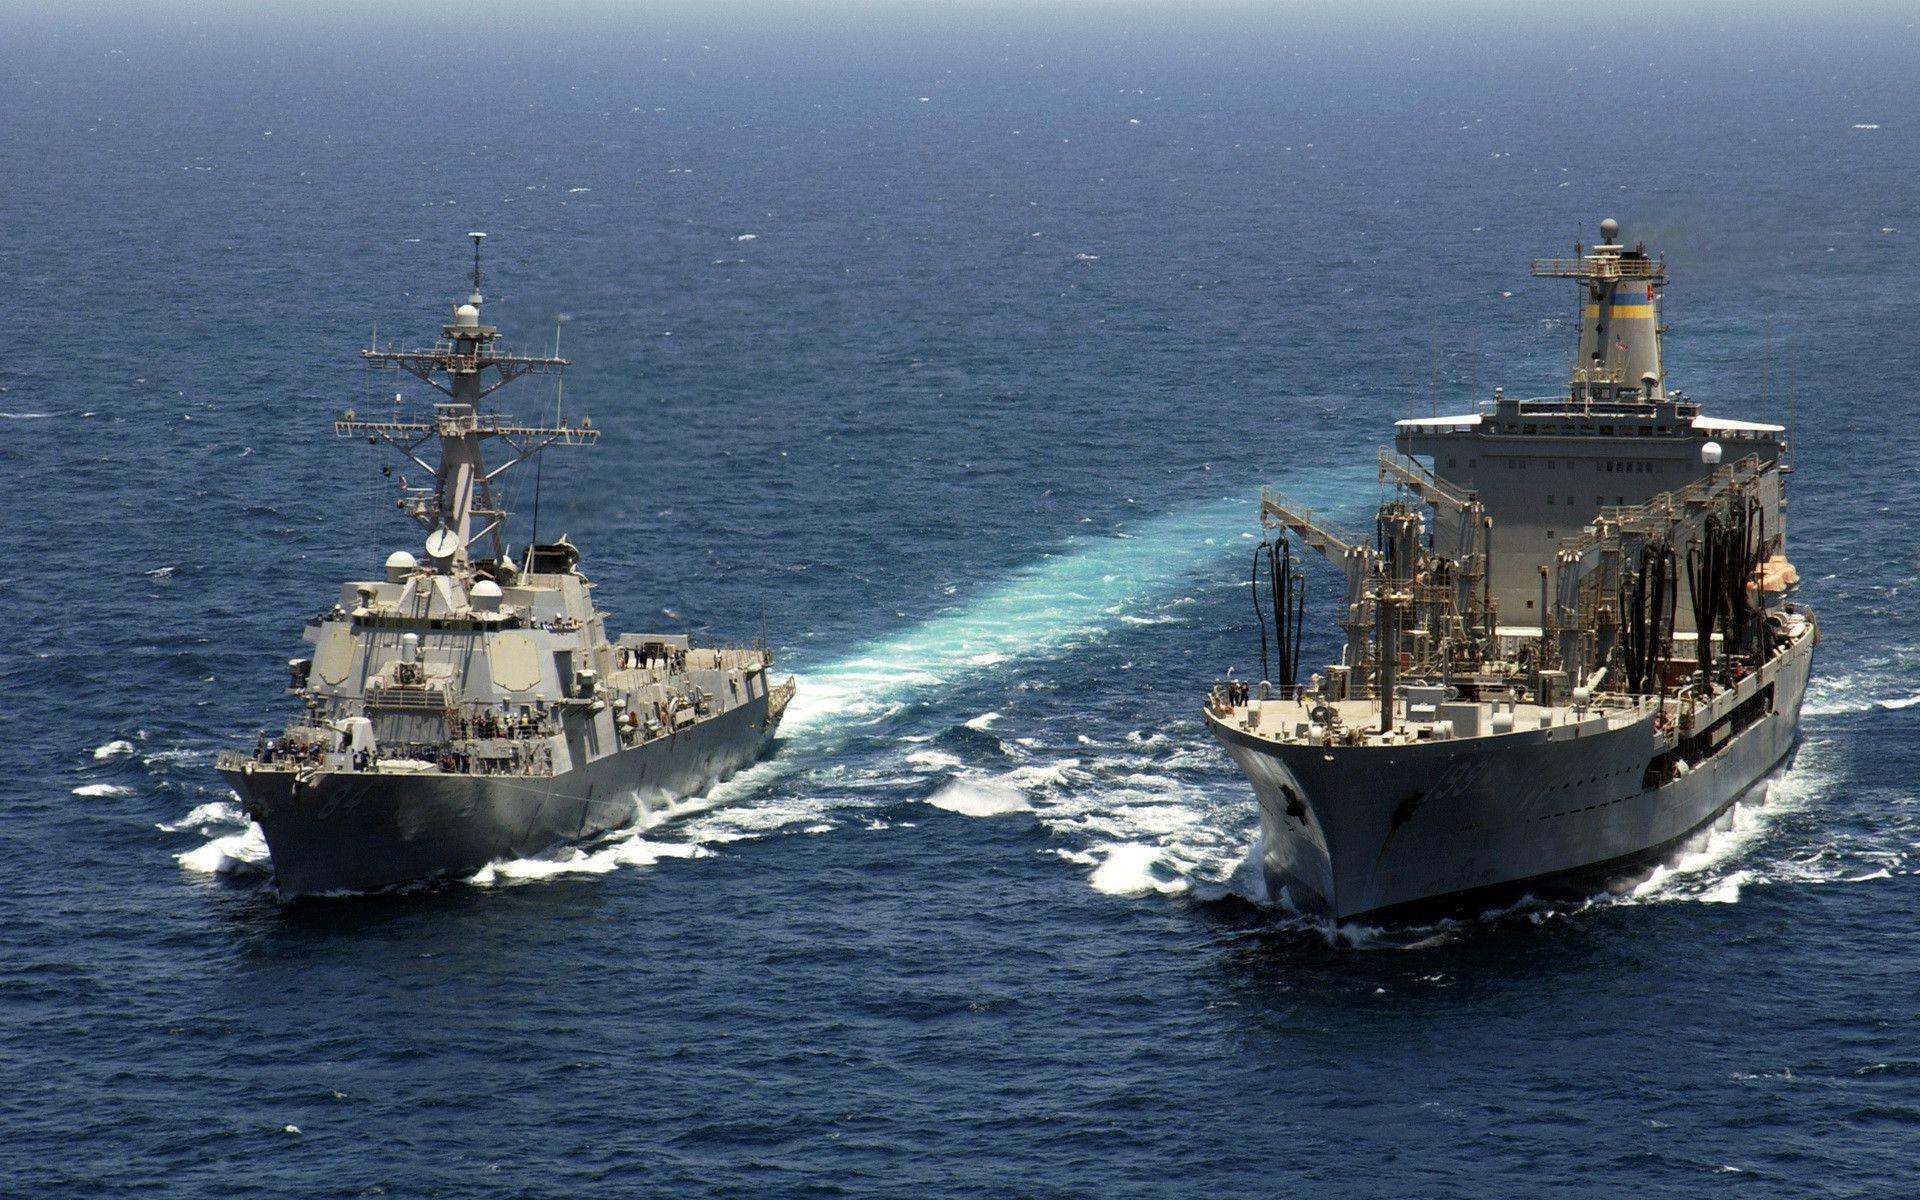 navy wallpaper 1440x900 ships - photo #23